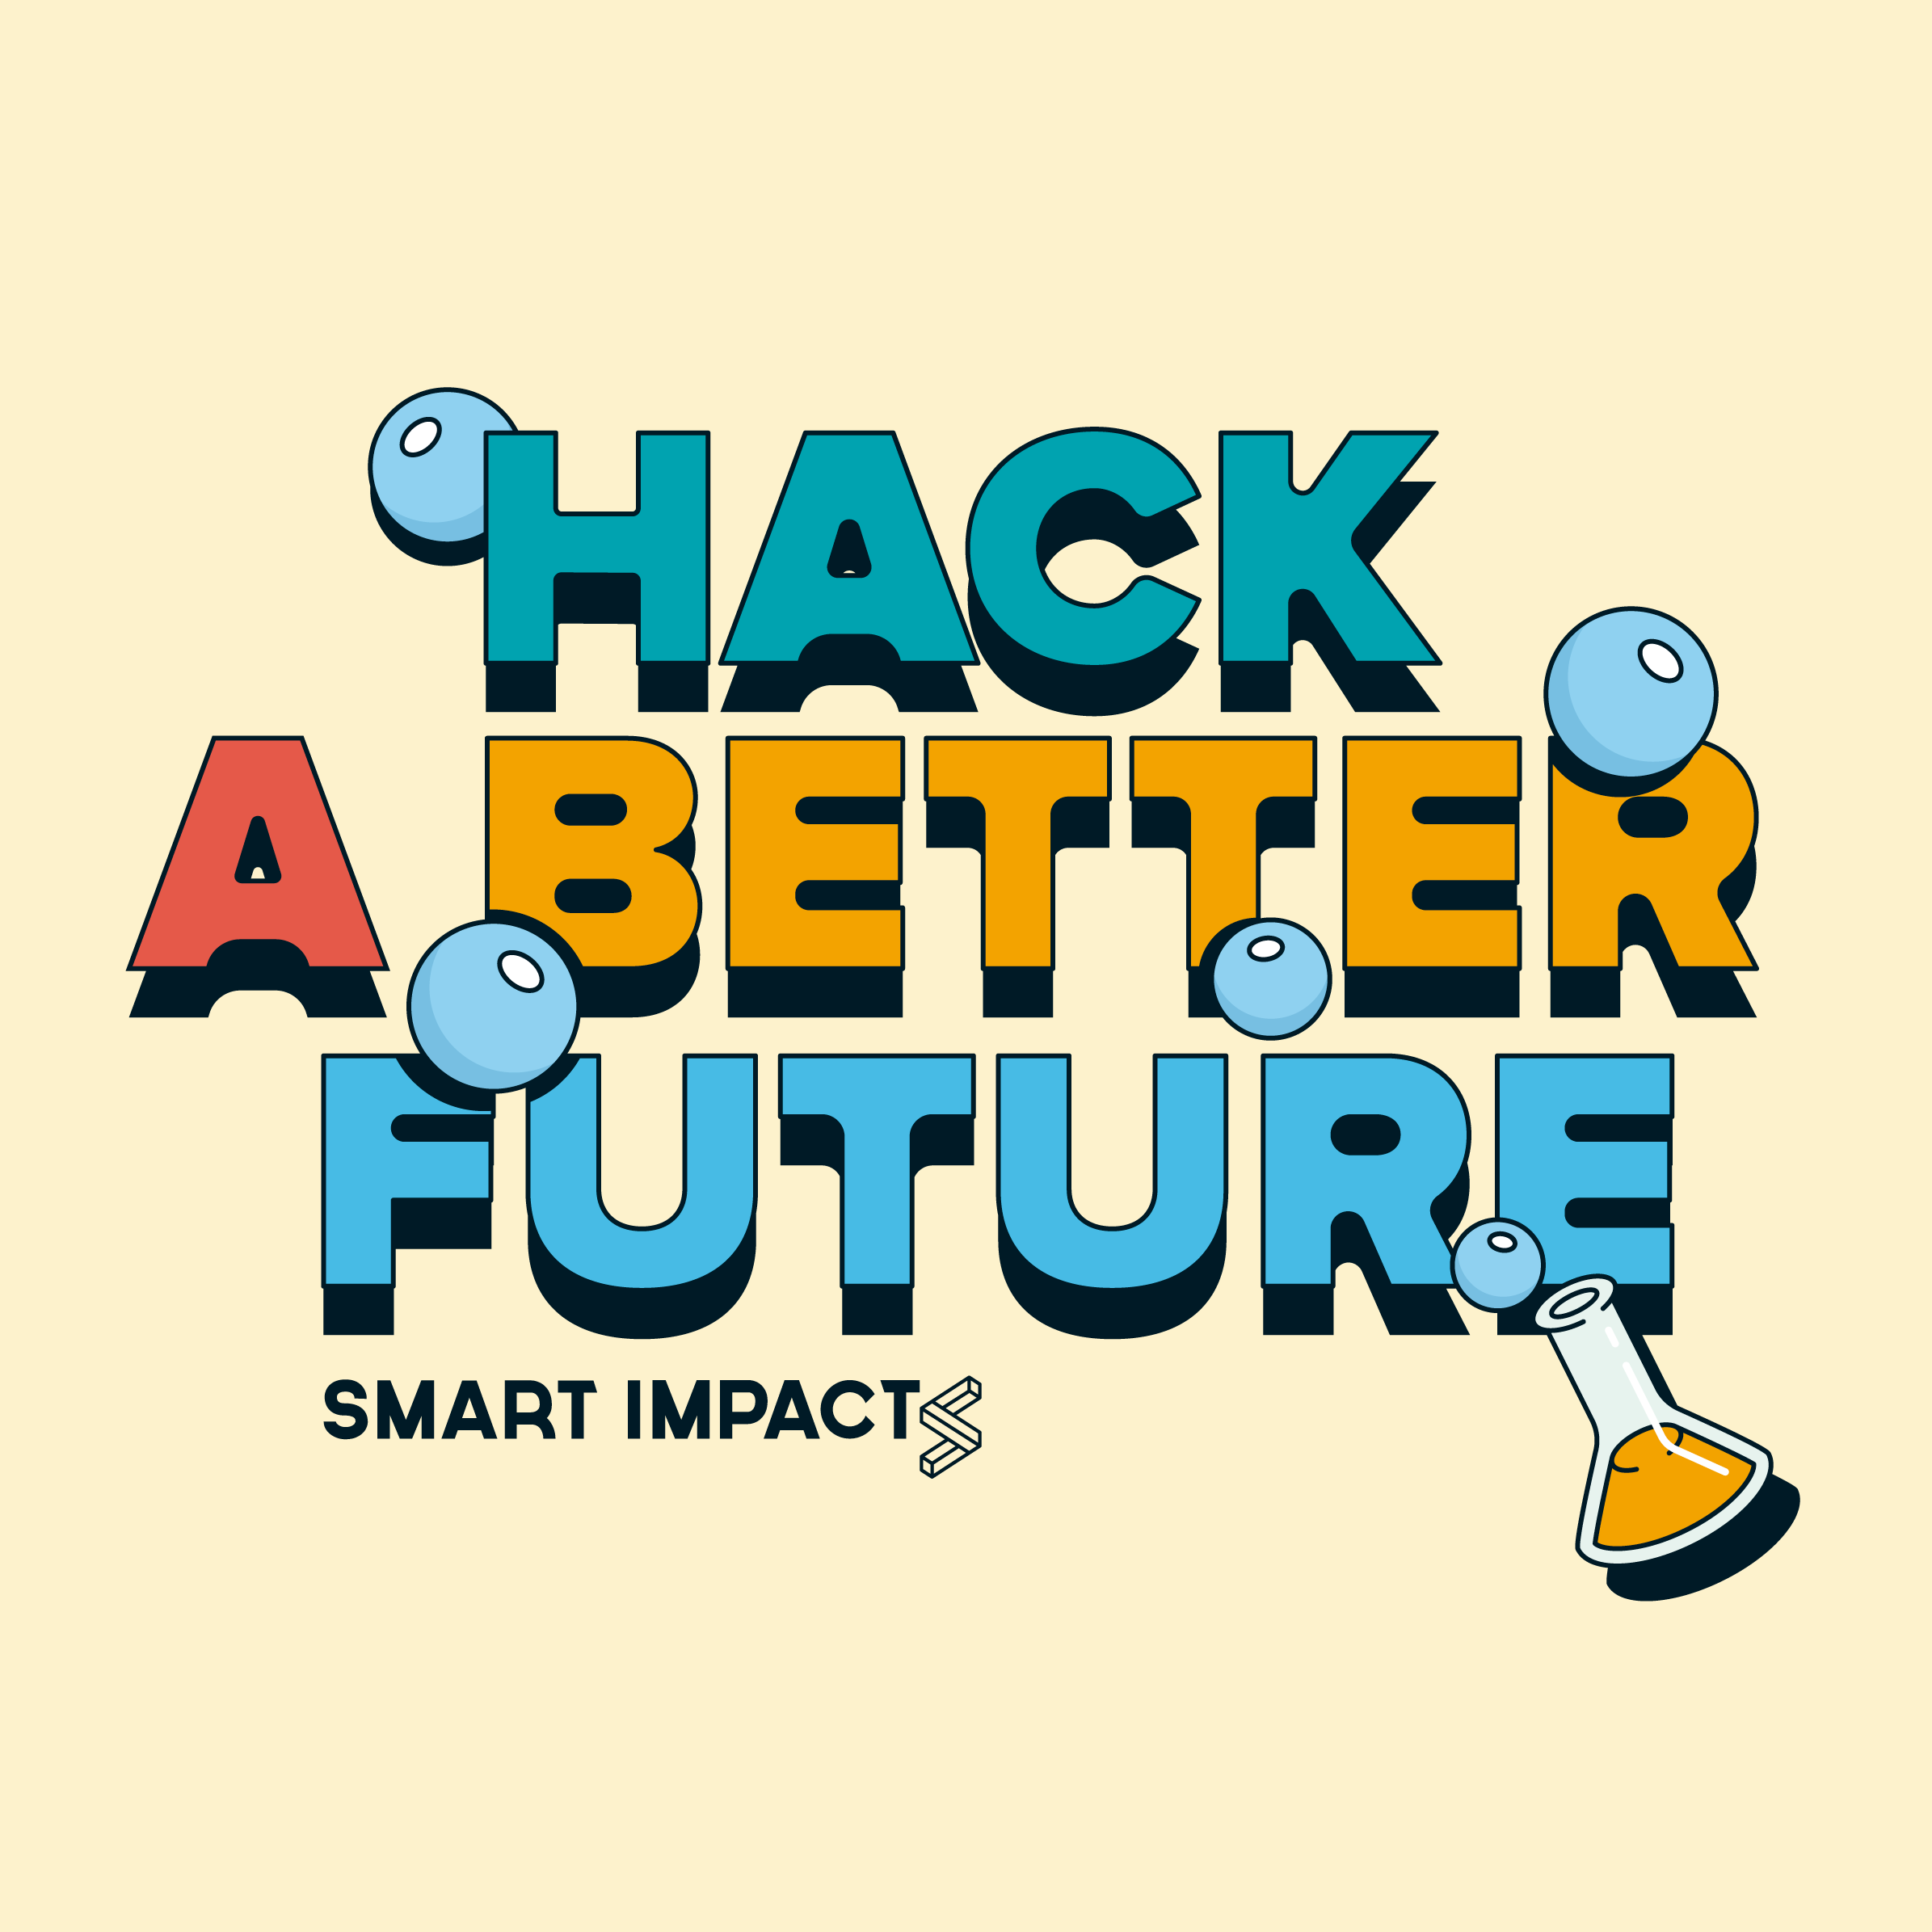 SMART IMPACT HACK 1